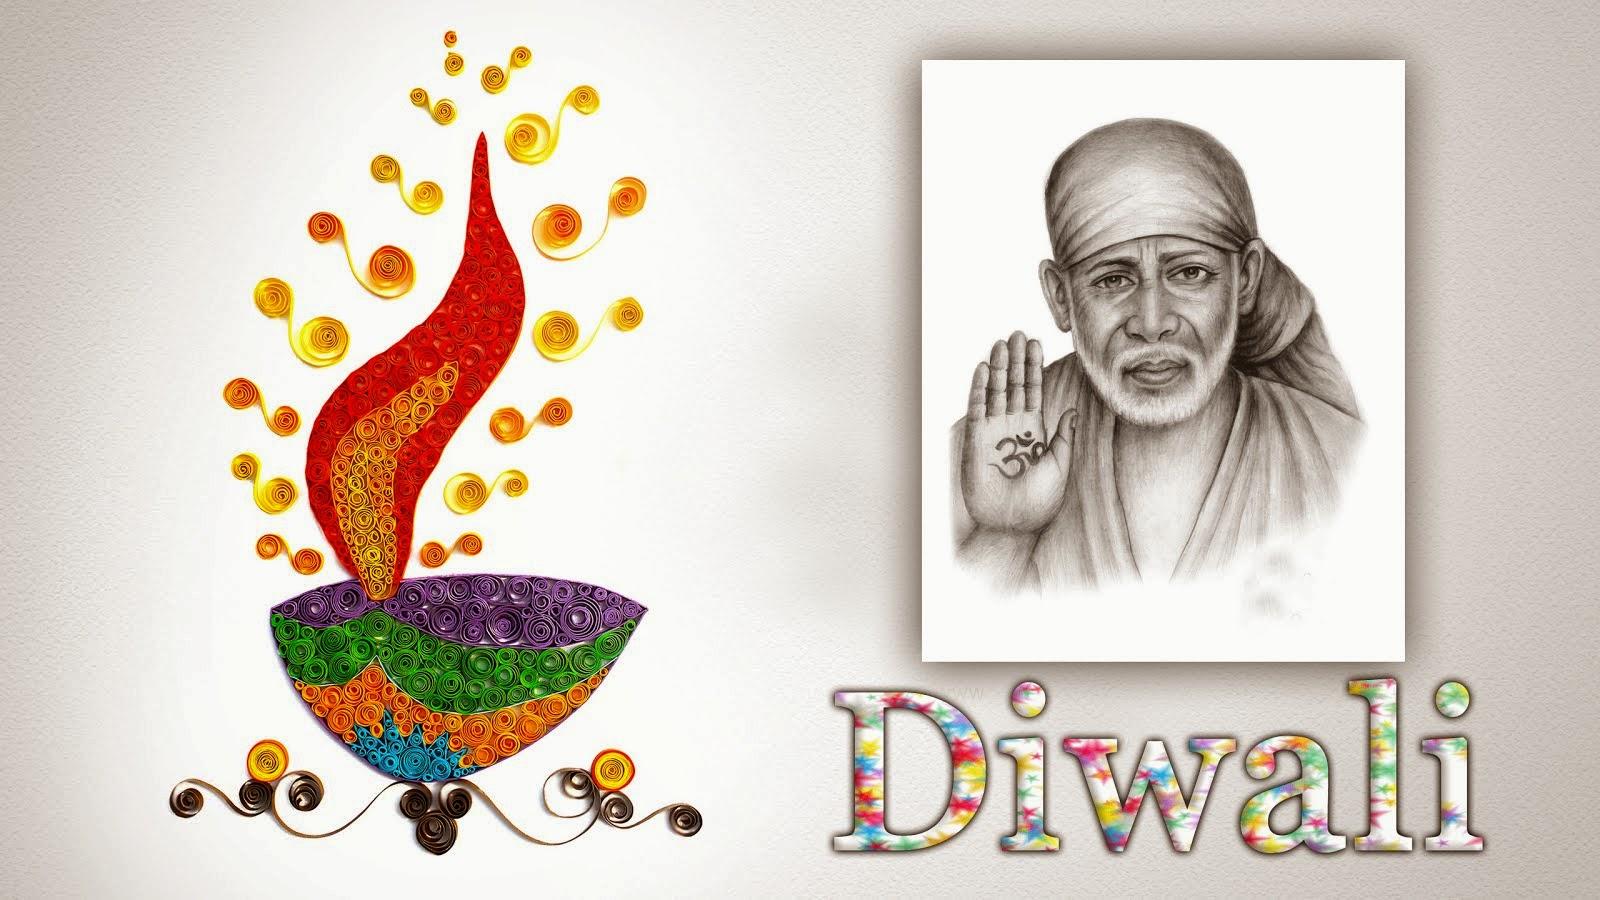 Download Diwali Images